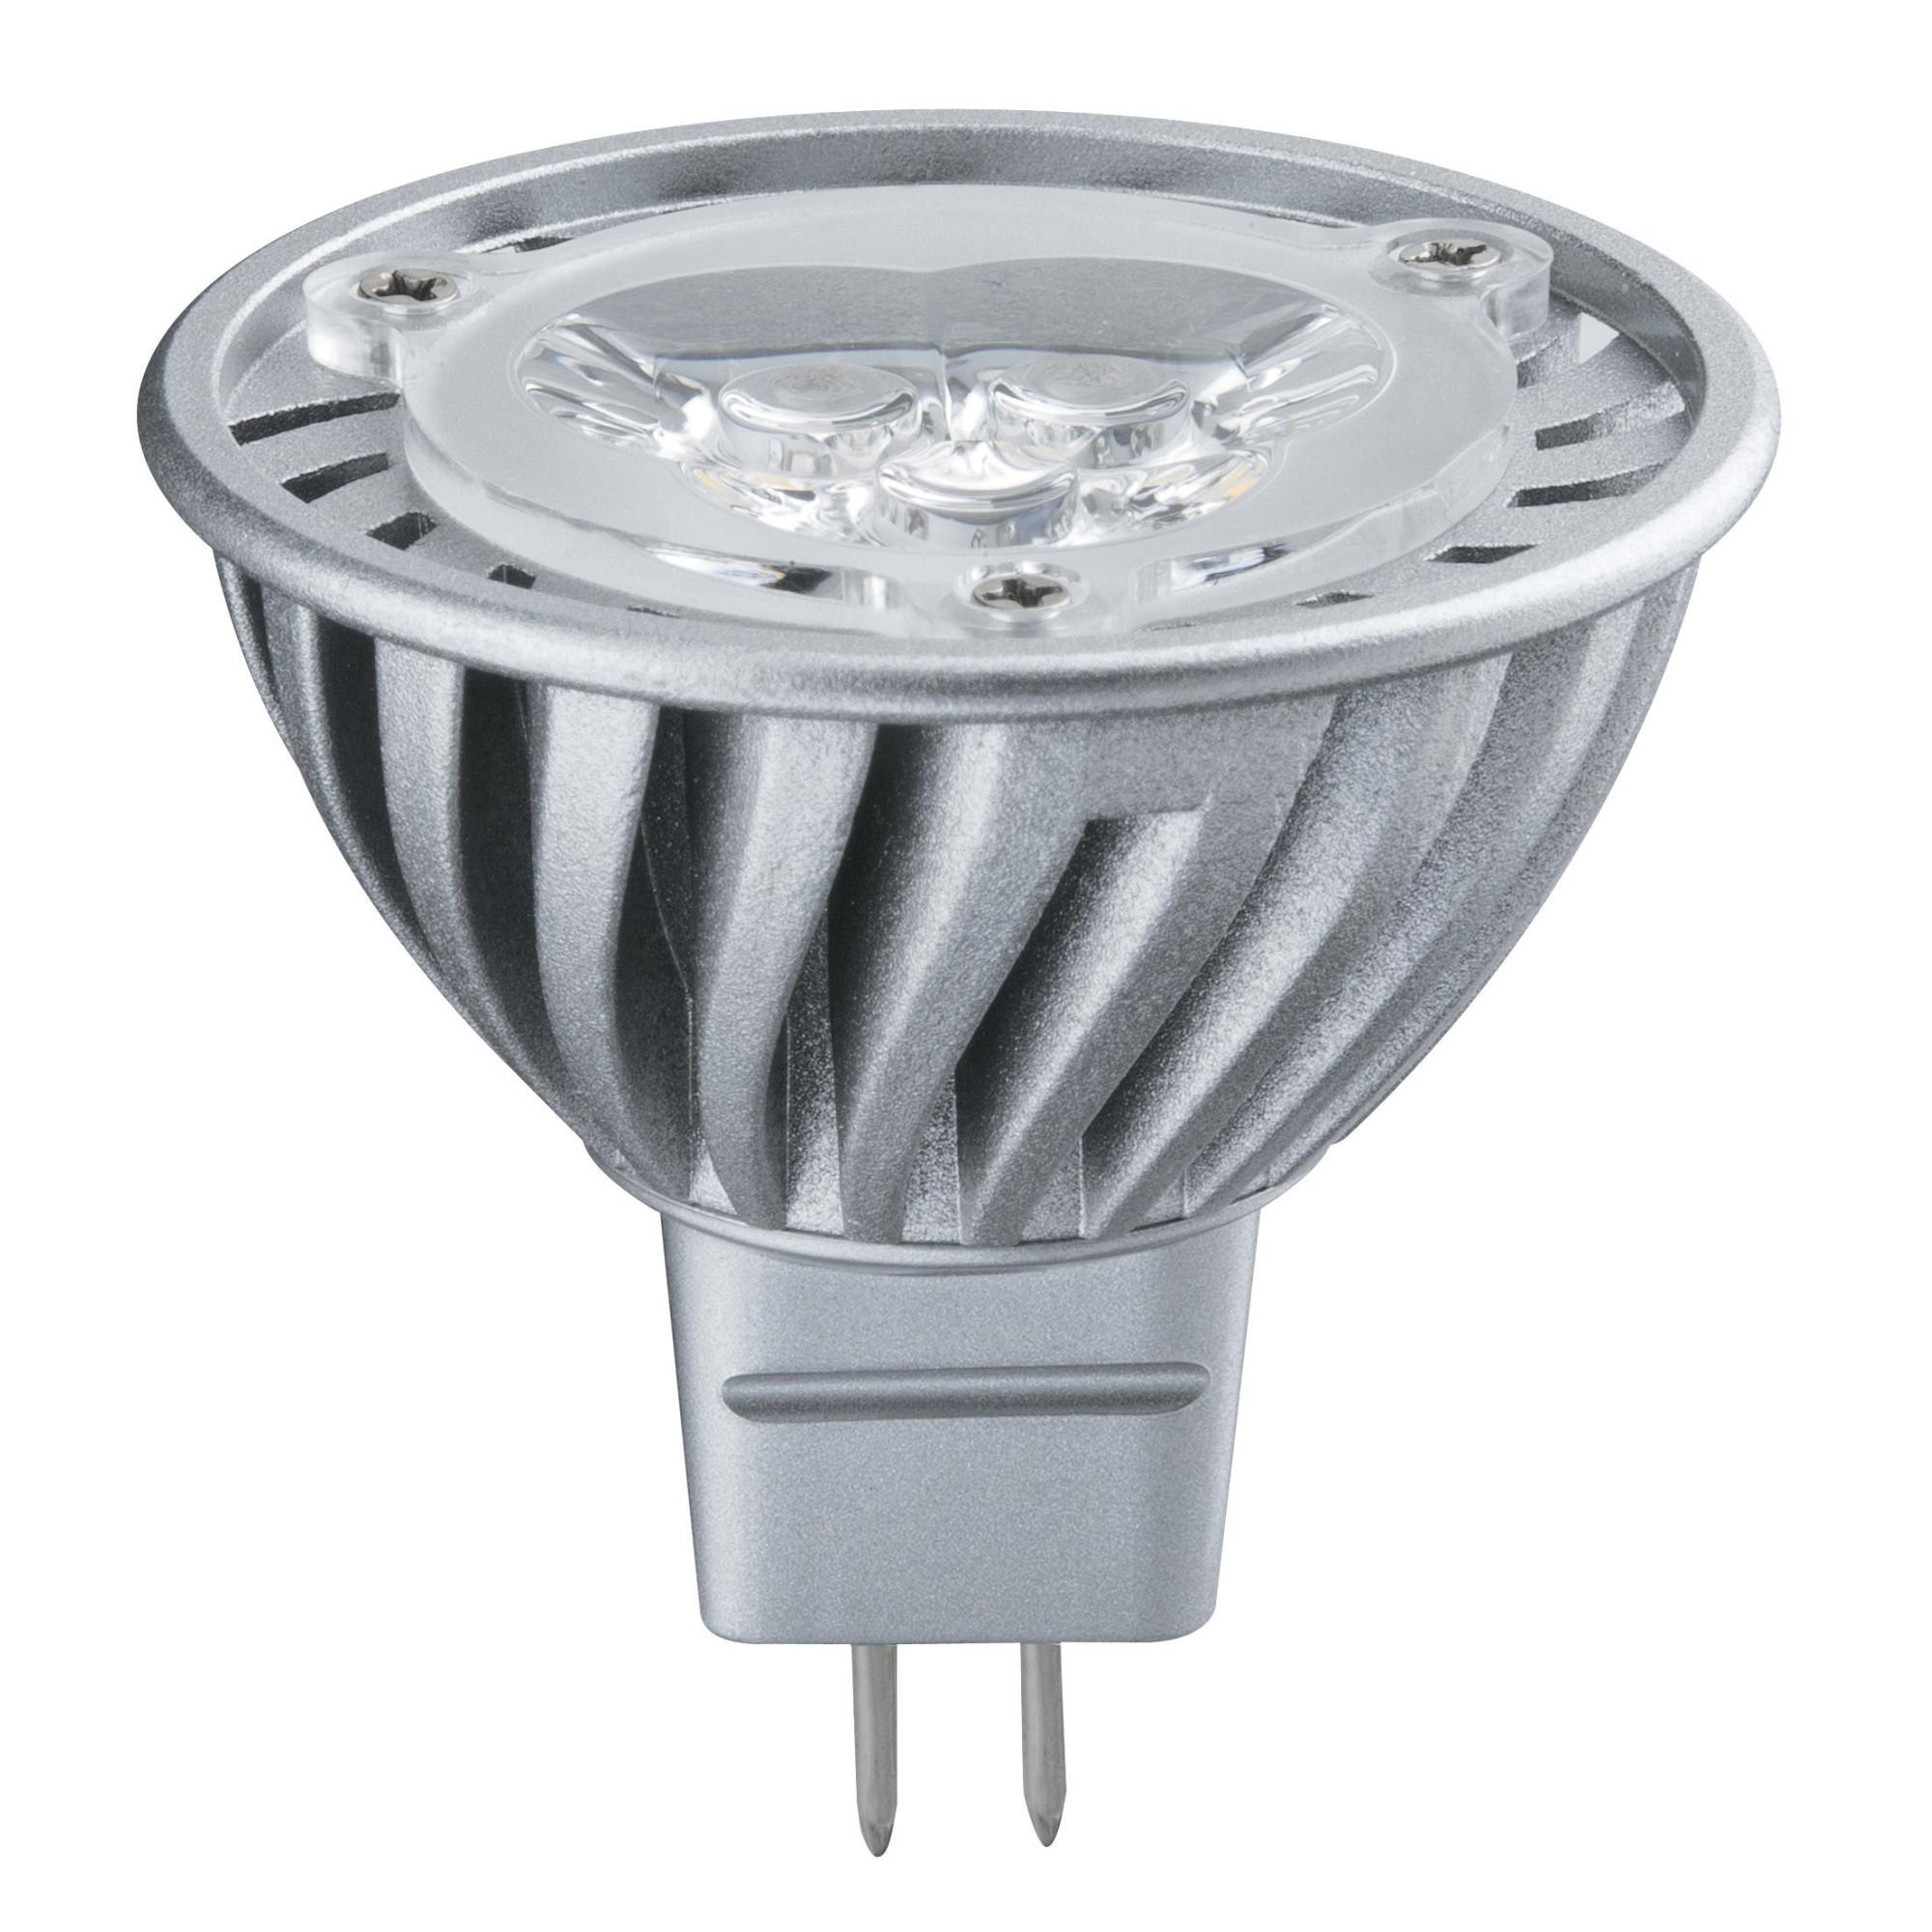 Лампа светодиодная PAULMANN 3399 GU5.3 16 Вт 163 Лм рефлекторная